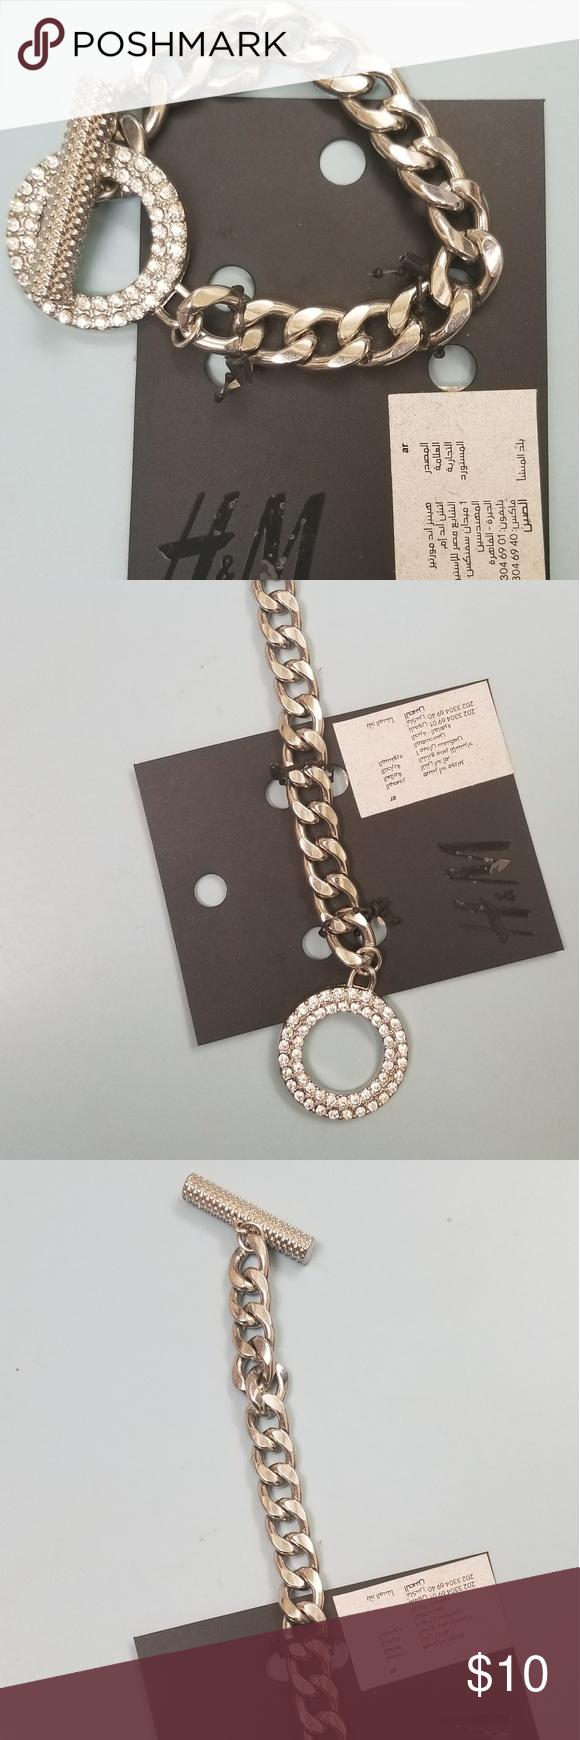 H M Bracelet Beautiful Brands Wrist Jewelry Bracelets